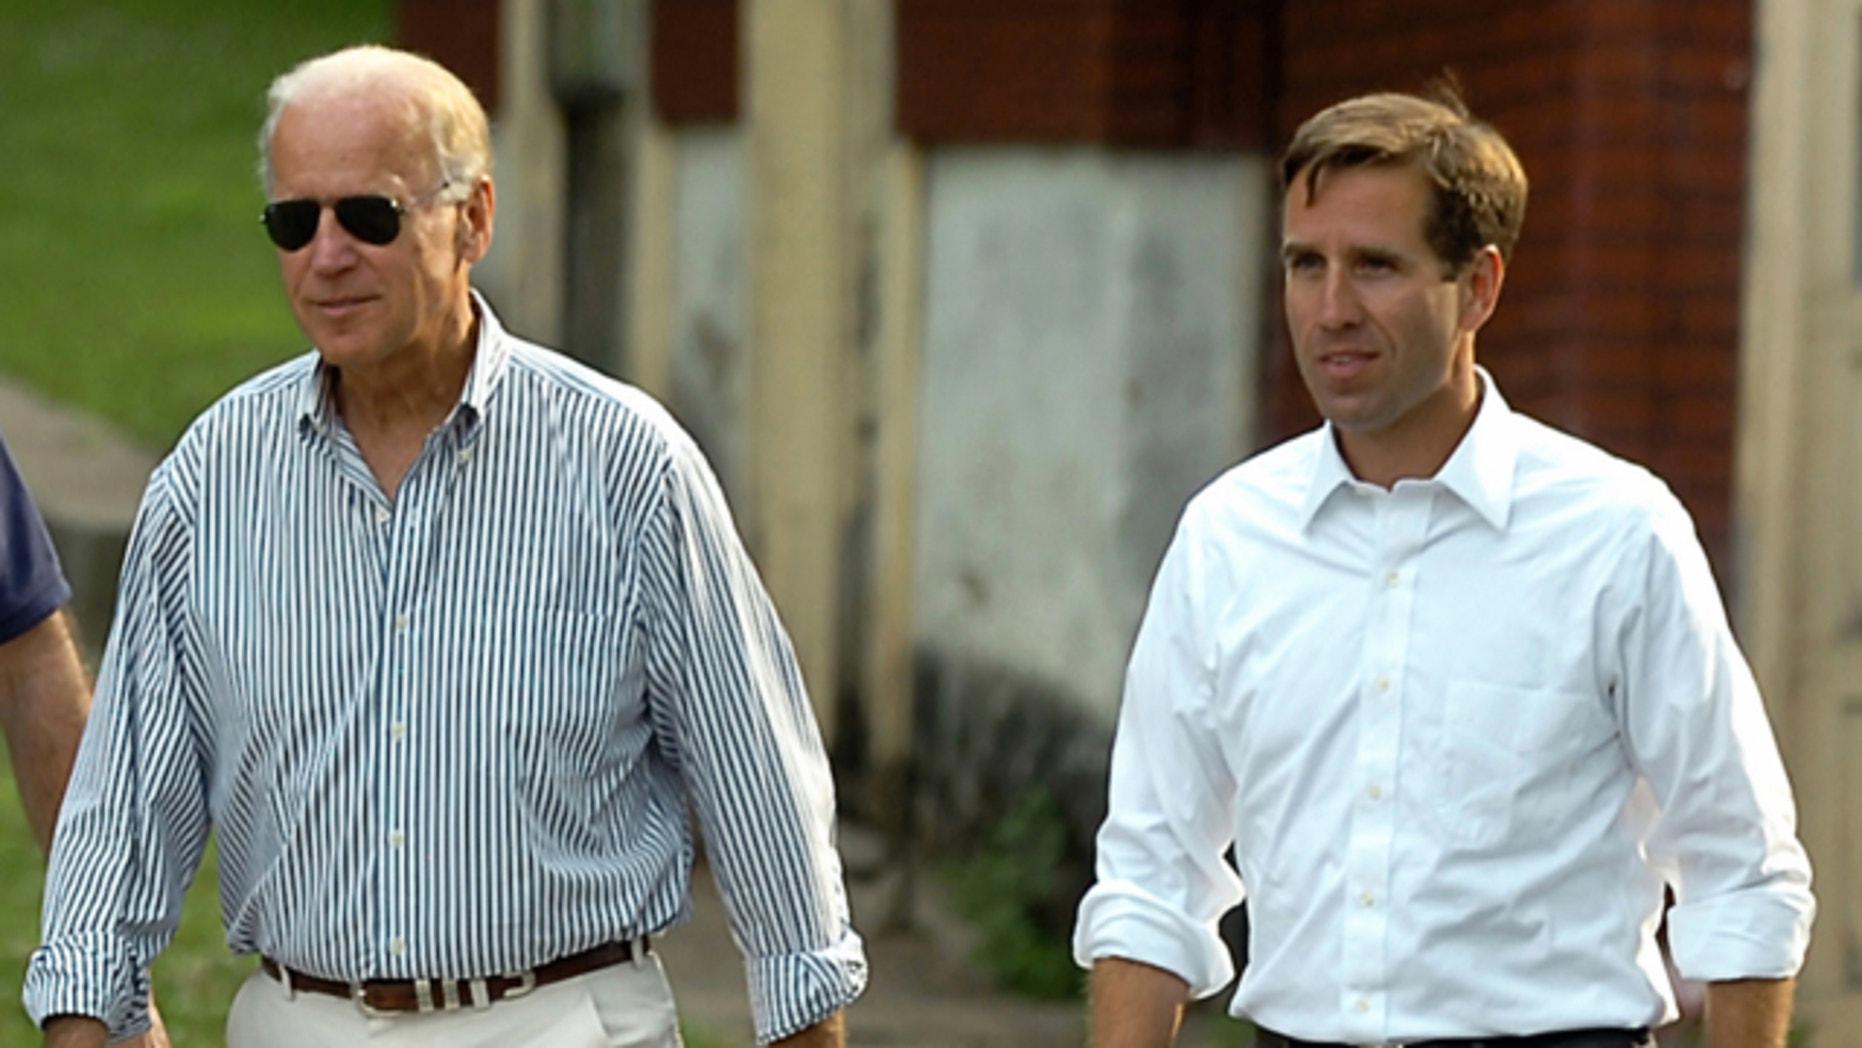 FILE: July 4, 2012: Delaware Attorney General Beau Biden, right, takes a walk with his father,Vice President Joe Biden, to the Green Ridge Little Baseball Field in Scranton, Pa.